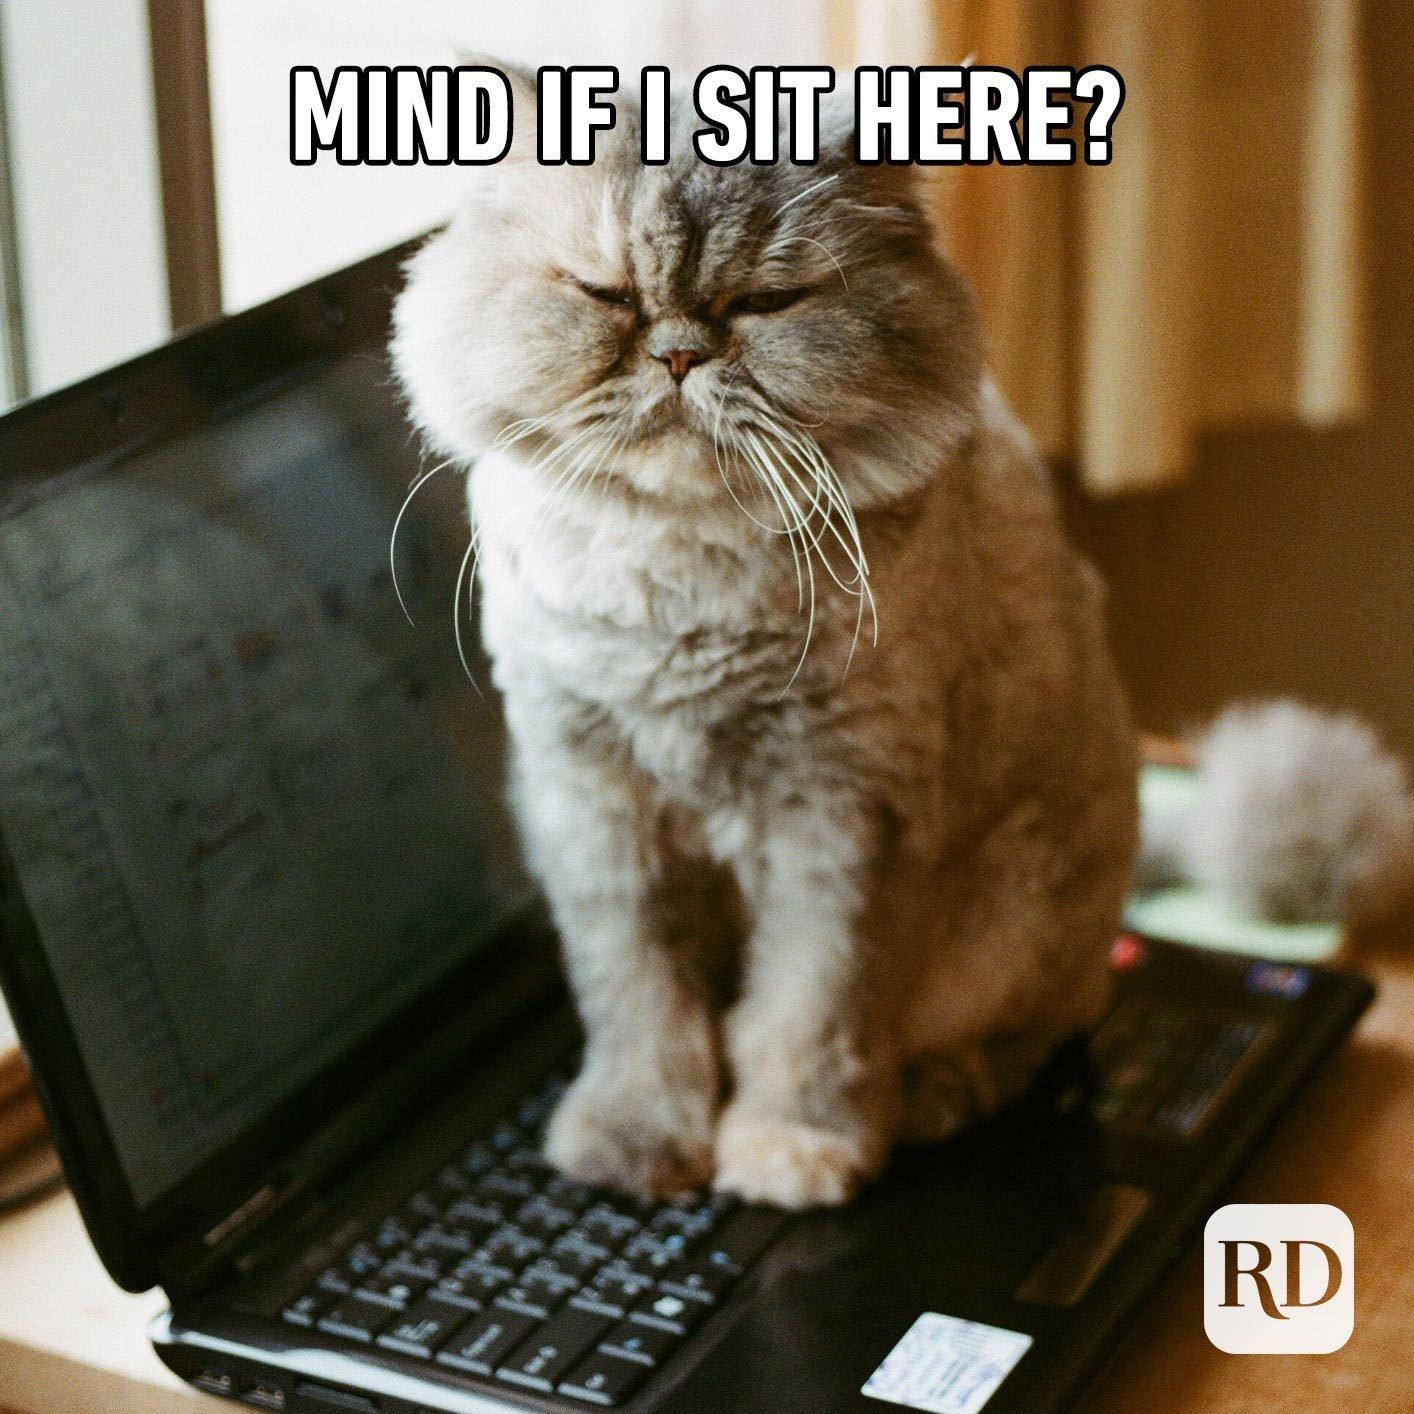 Cat sitting on laptop keys. Meme text: Mind if I sit here?